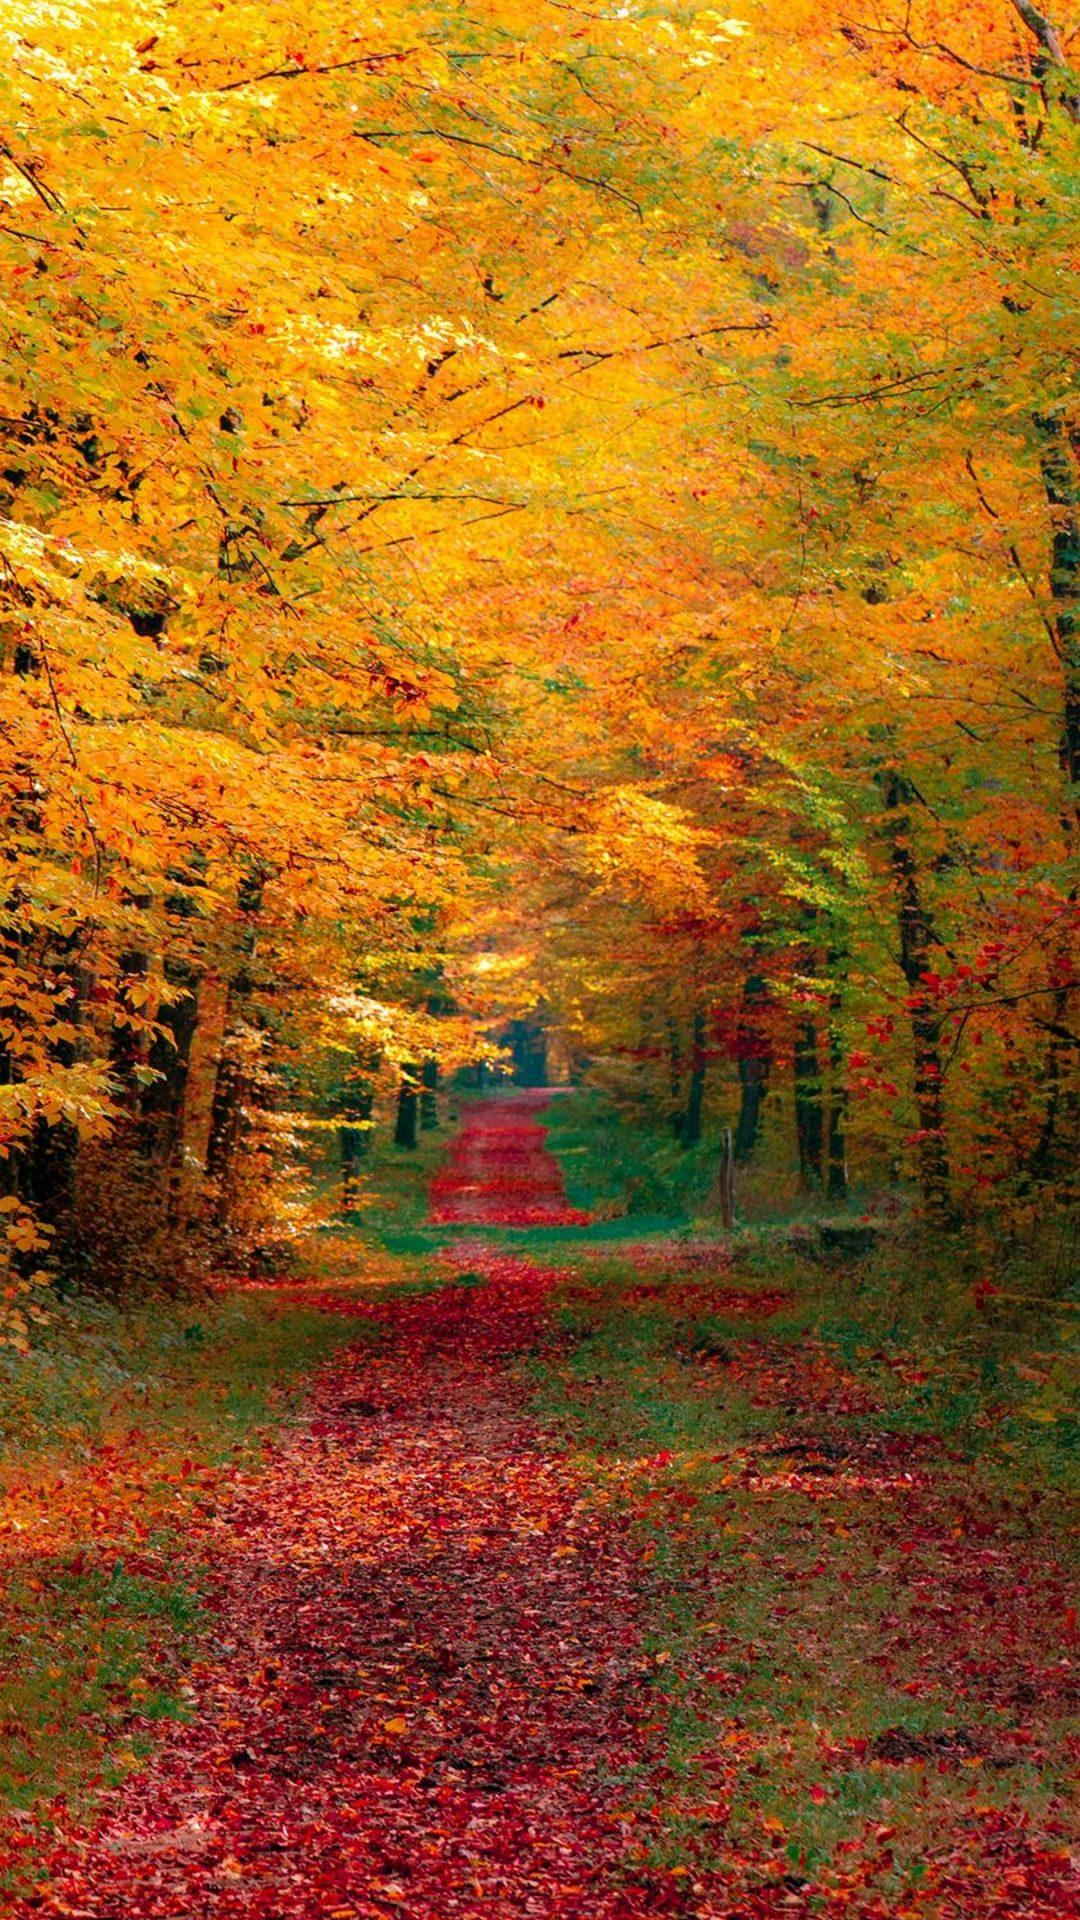 Iphone 6s Wallpaper Fall Autumn Trees Wallpaper 4k Hd Wallpaper Background